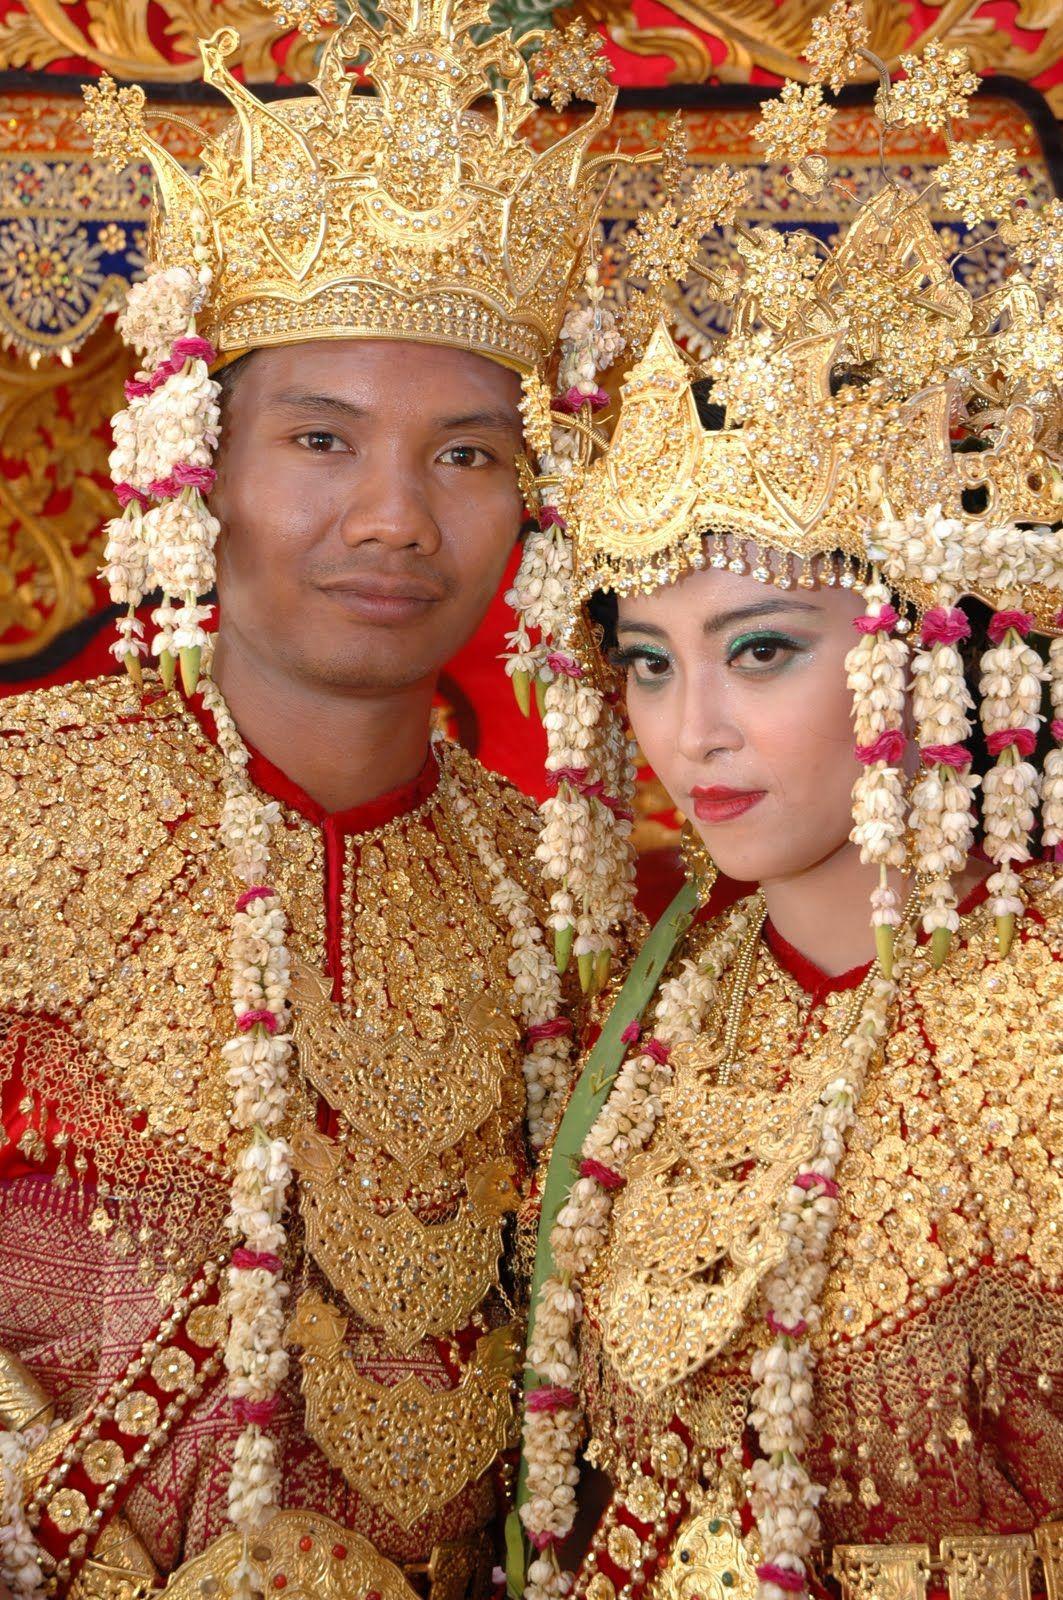 palembang peopleIndonesia Traditional Costumes